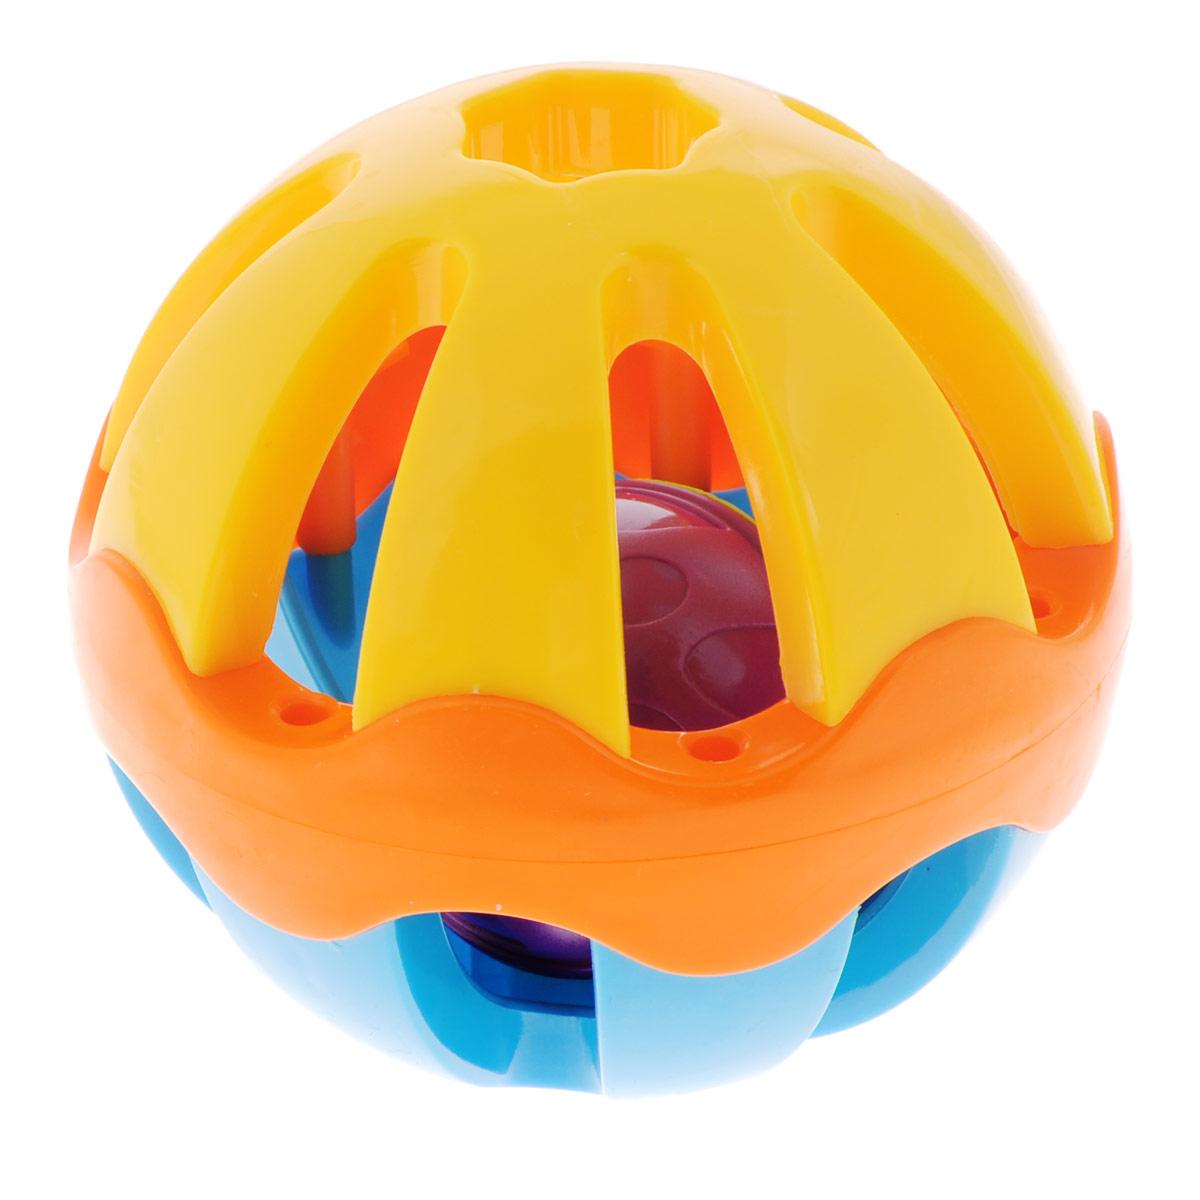 Погремушка Mioshi Шар развивающая игрушка погремушка mioshi черепашка